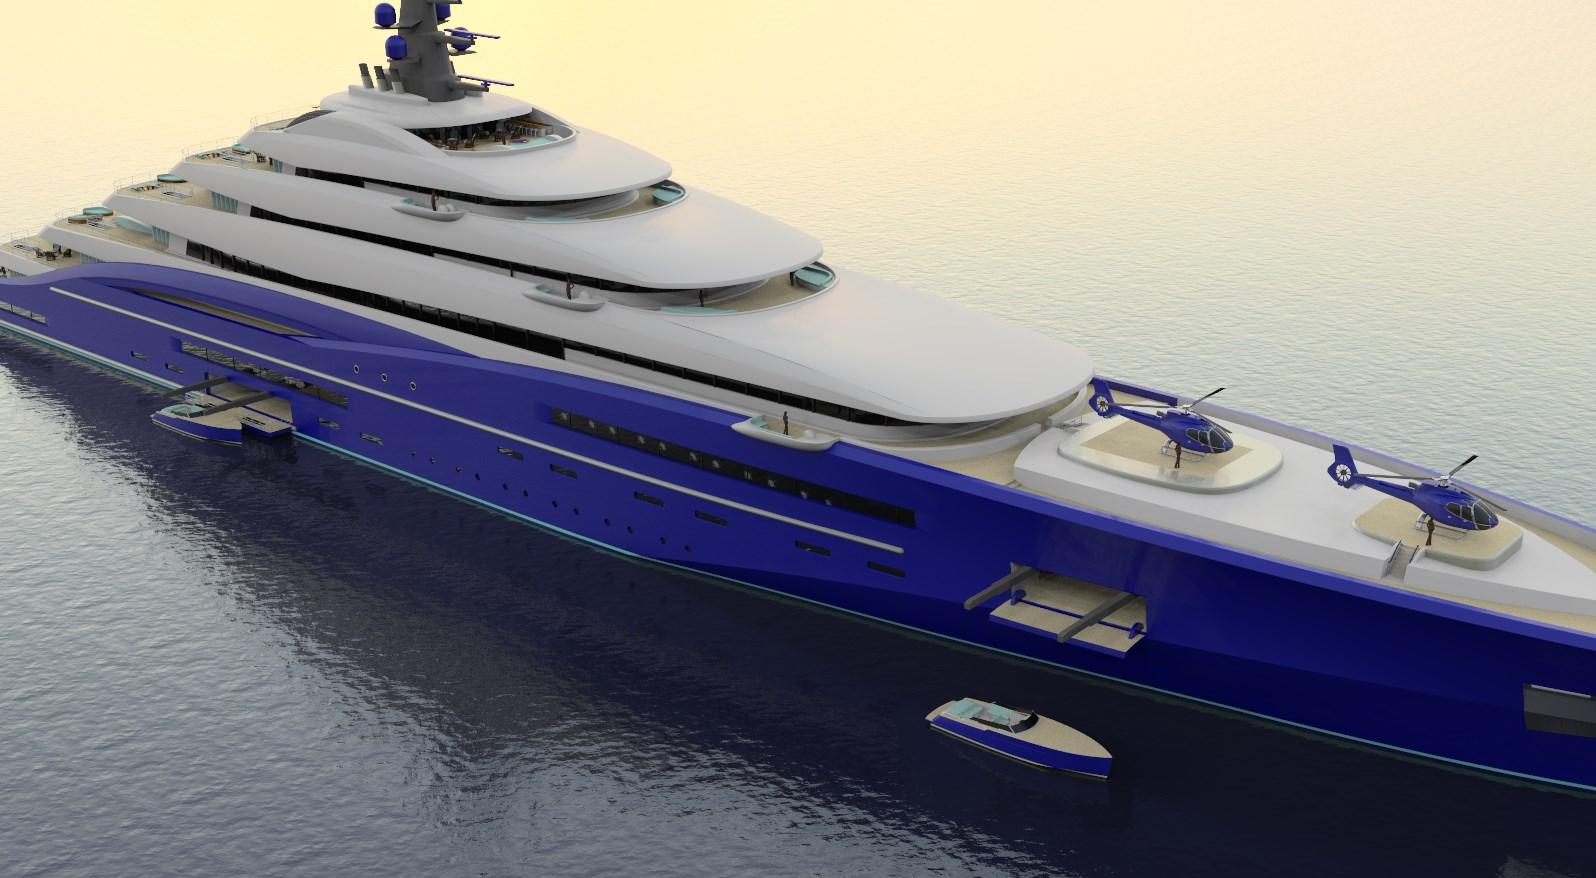 Biggest yachts